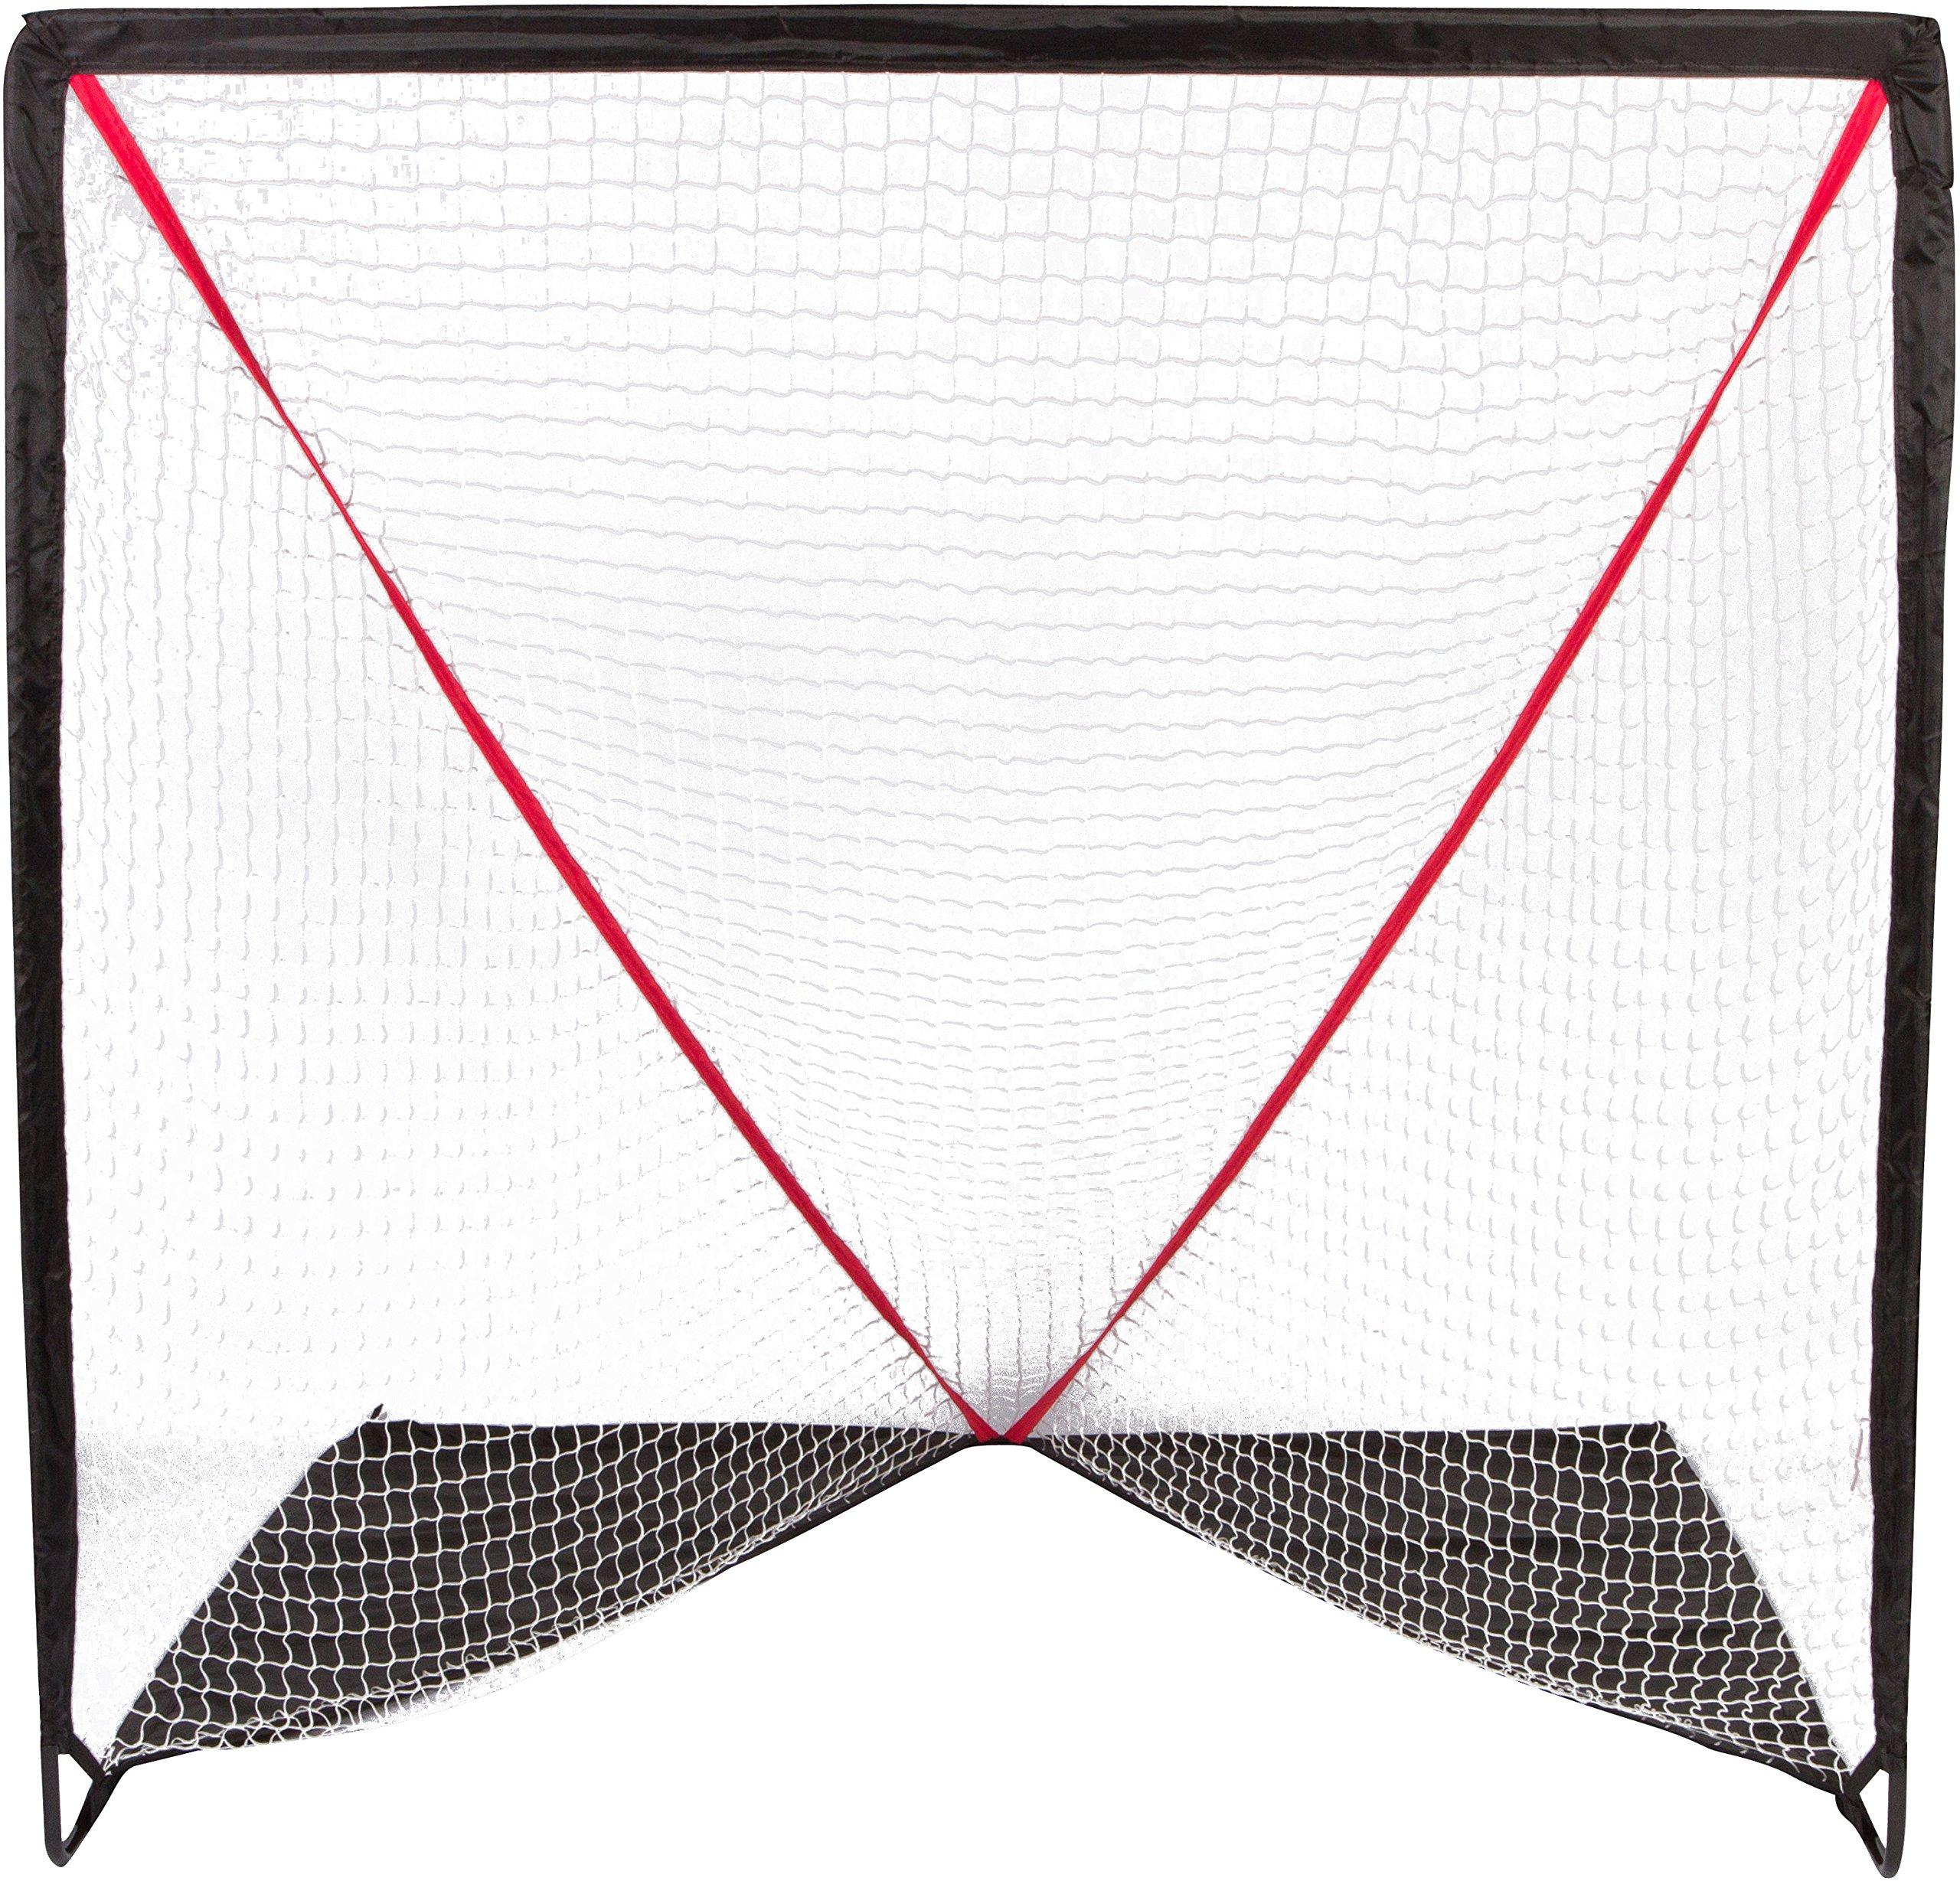 Trademark Innovations 6' Backyard Portable Lacrosse Goal Carry Bag